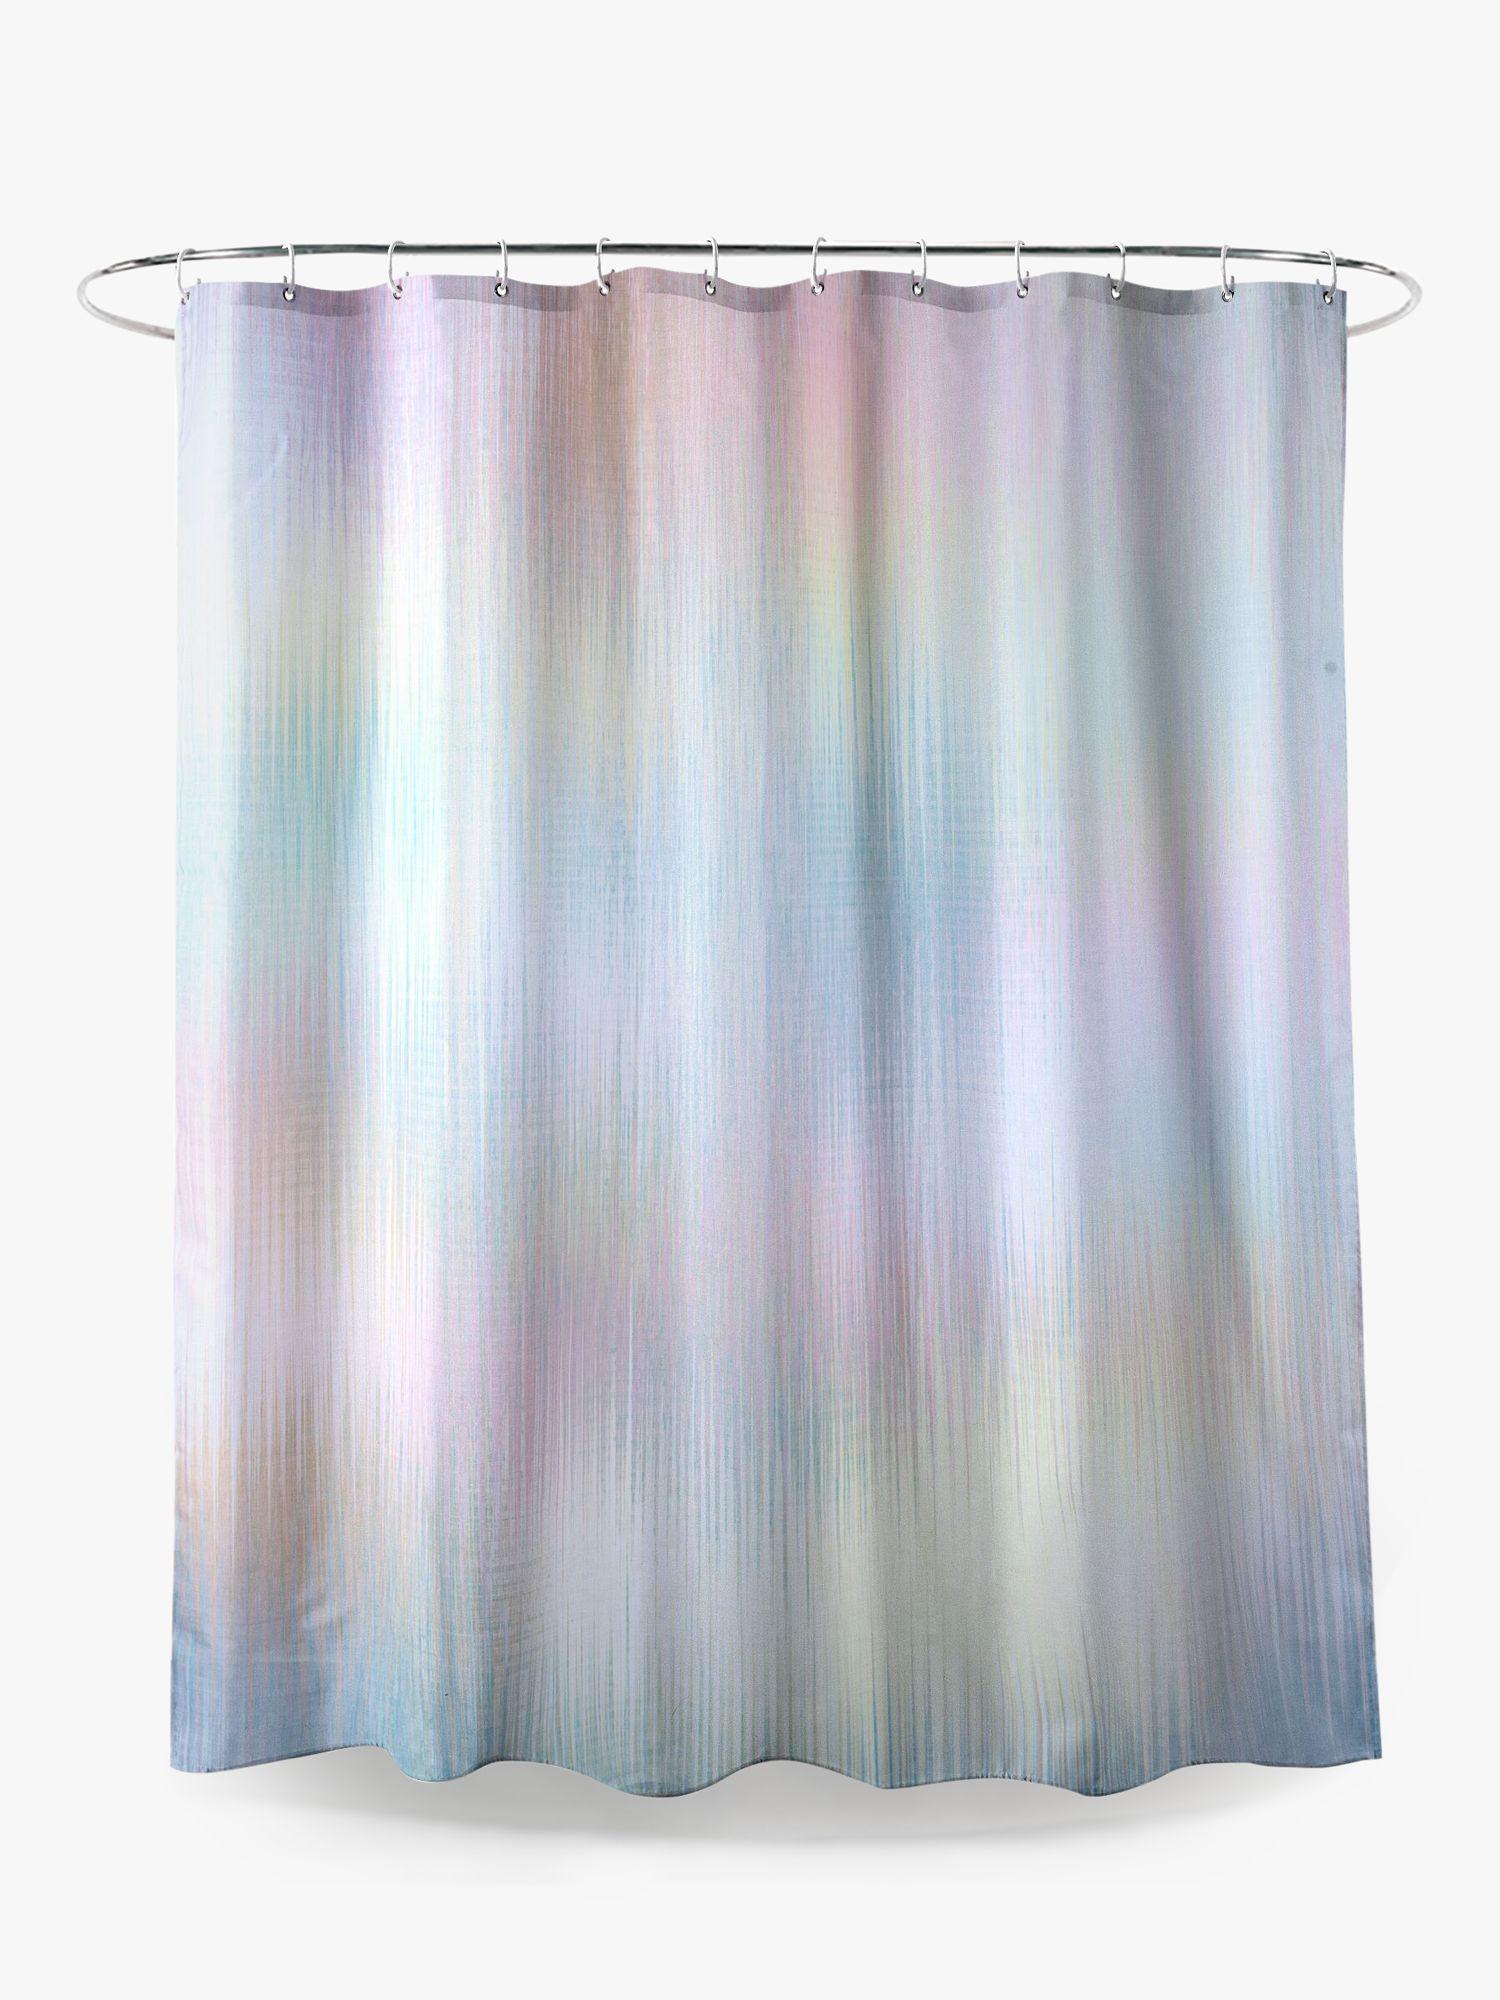 John Lewis & Partners Rainbow Shower Curtain